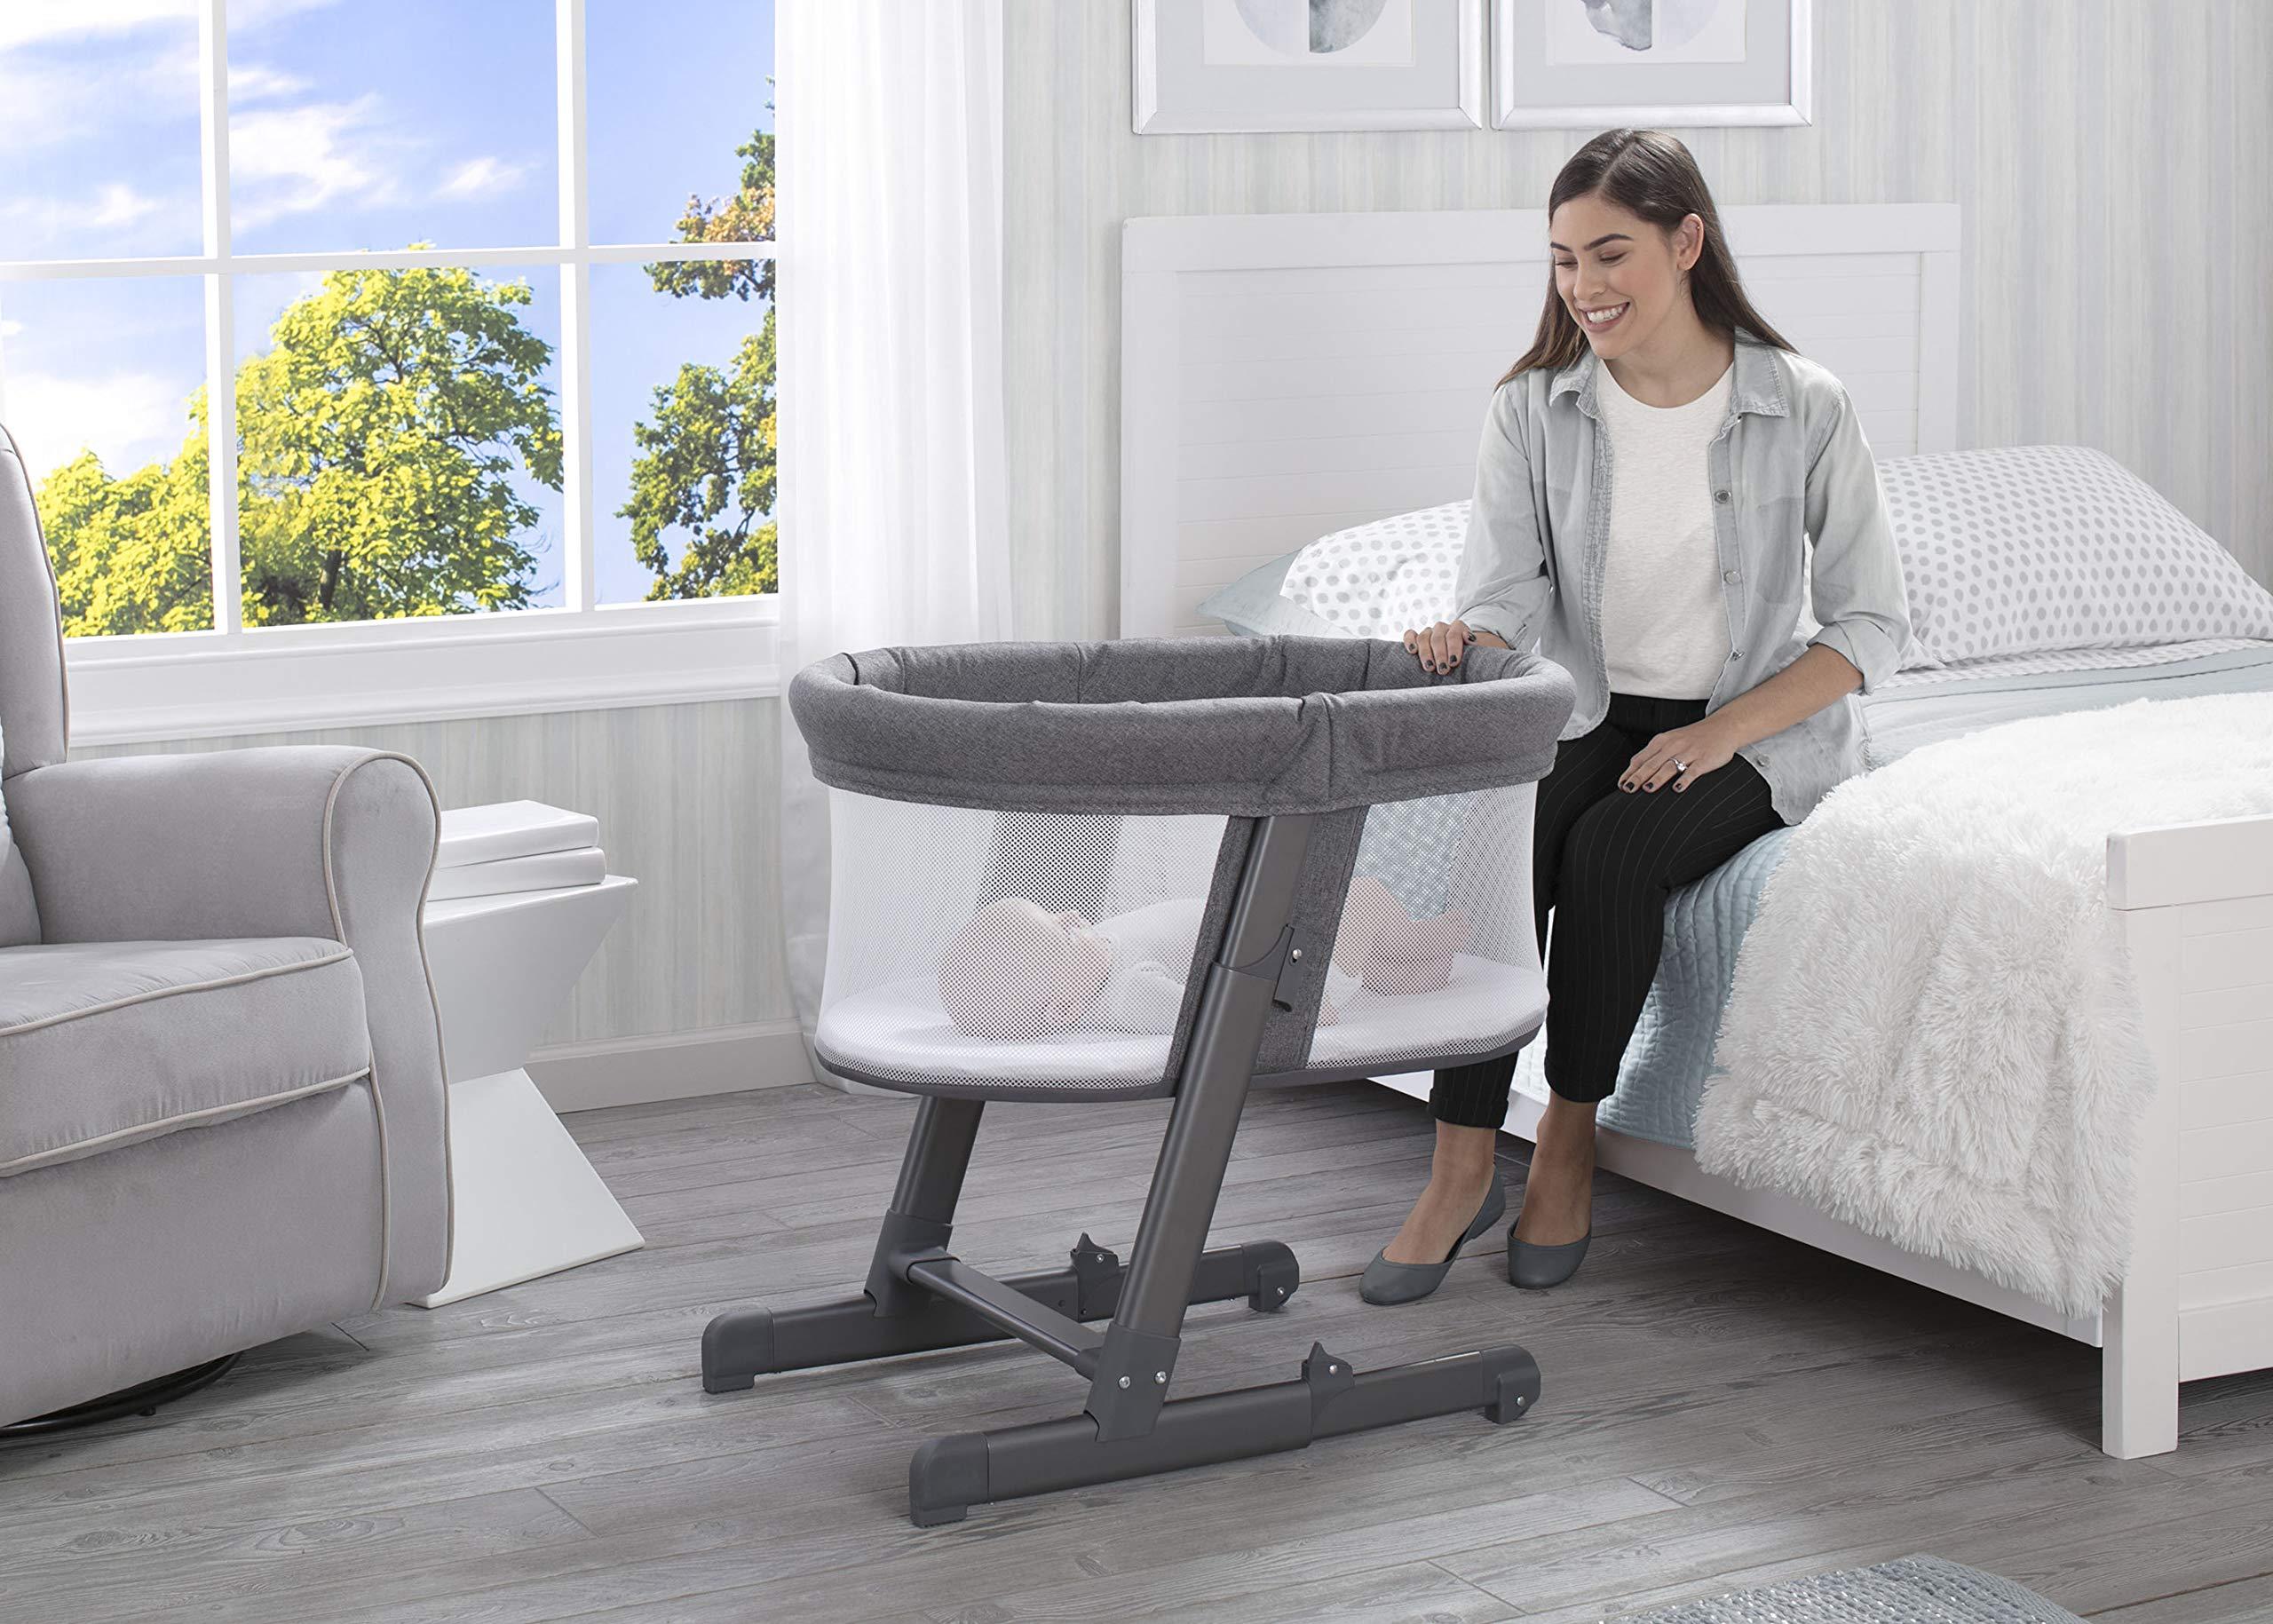 Simmons Kids Oval City Sleeper Bedside Bassinet – Adjustable Height Portable Crib with Wheels & Airflow Mesh, Grey Tweed